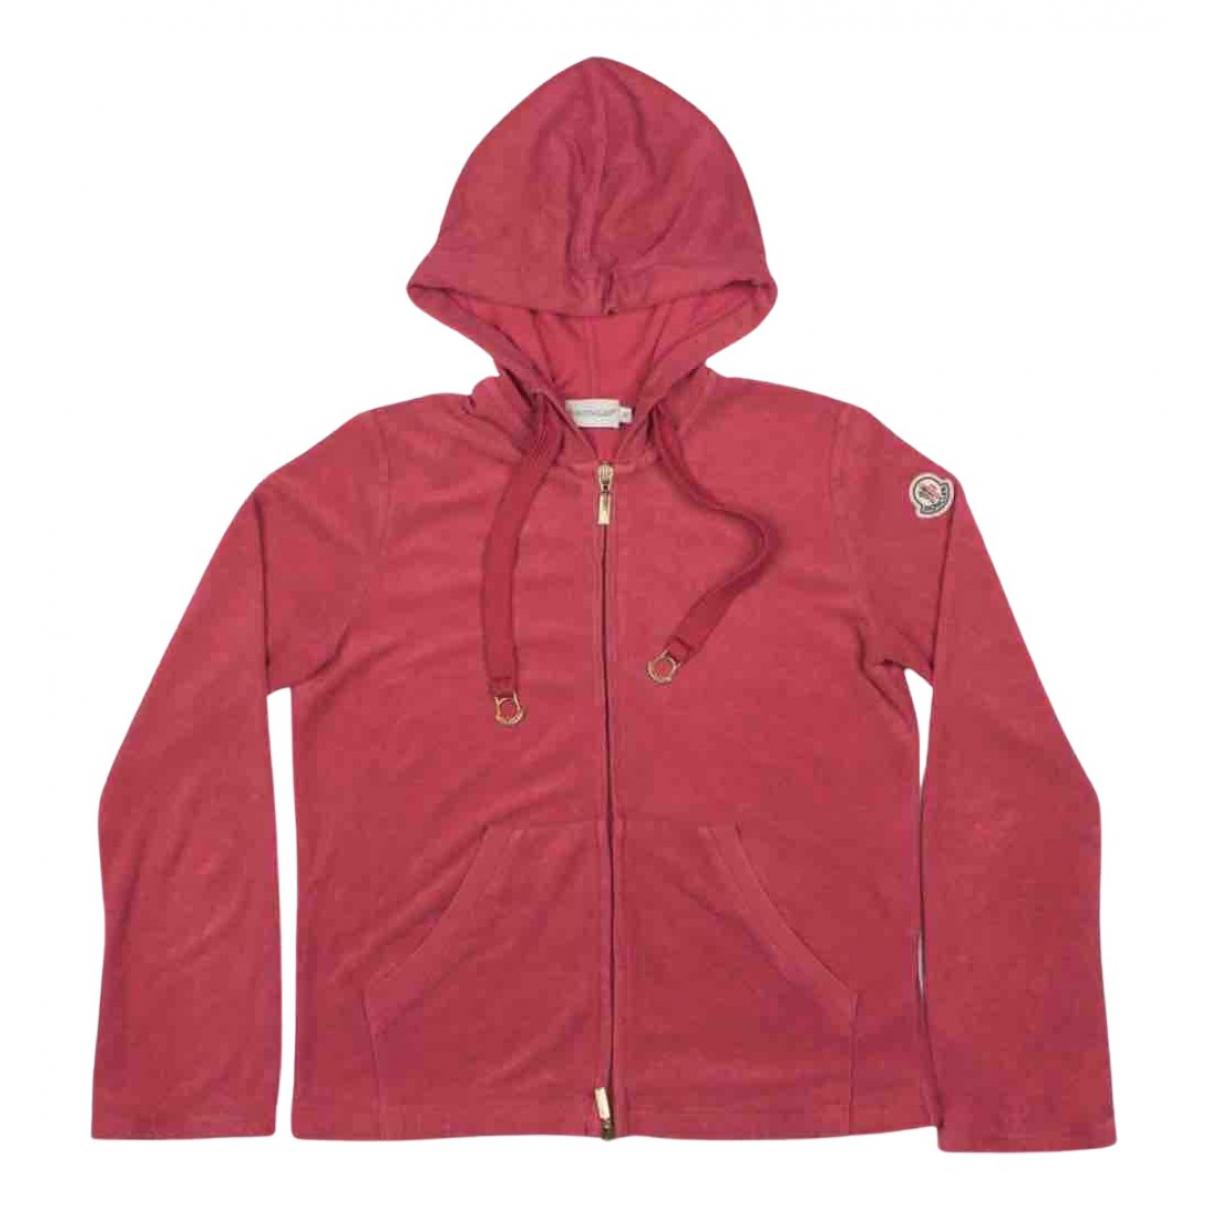 Moncler N Pink Cotton Knitwear for Women S International